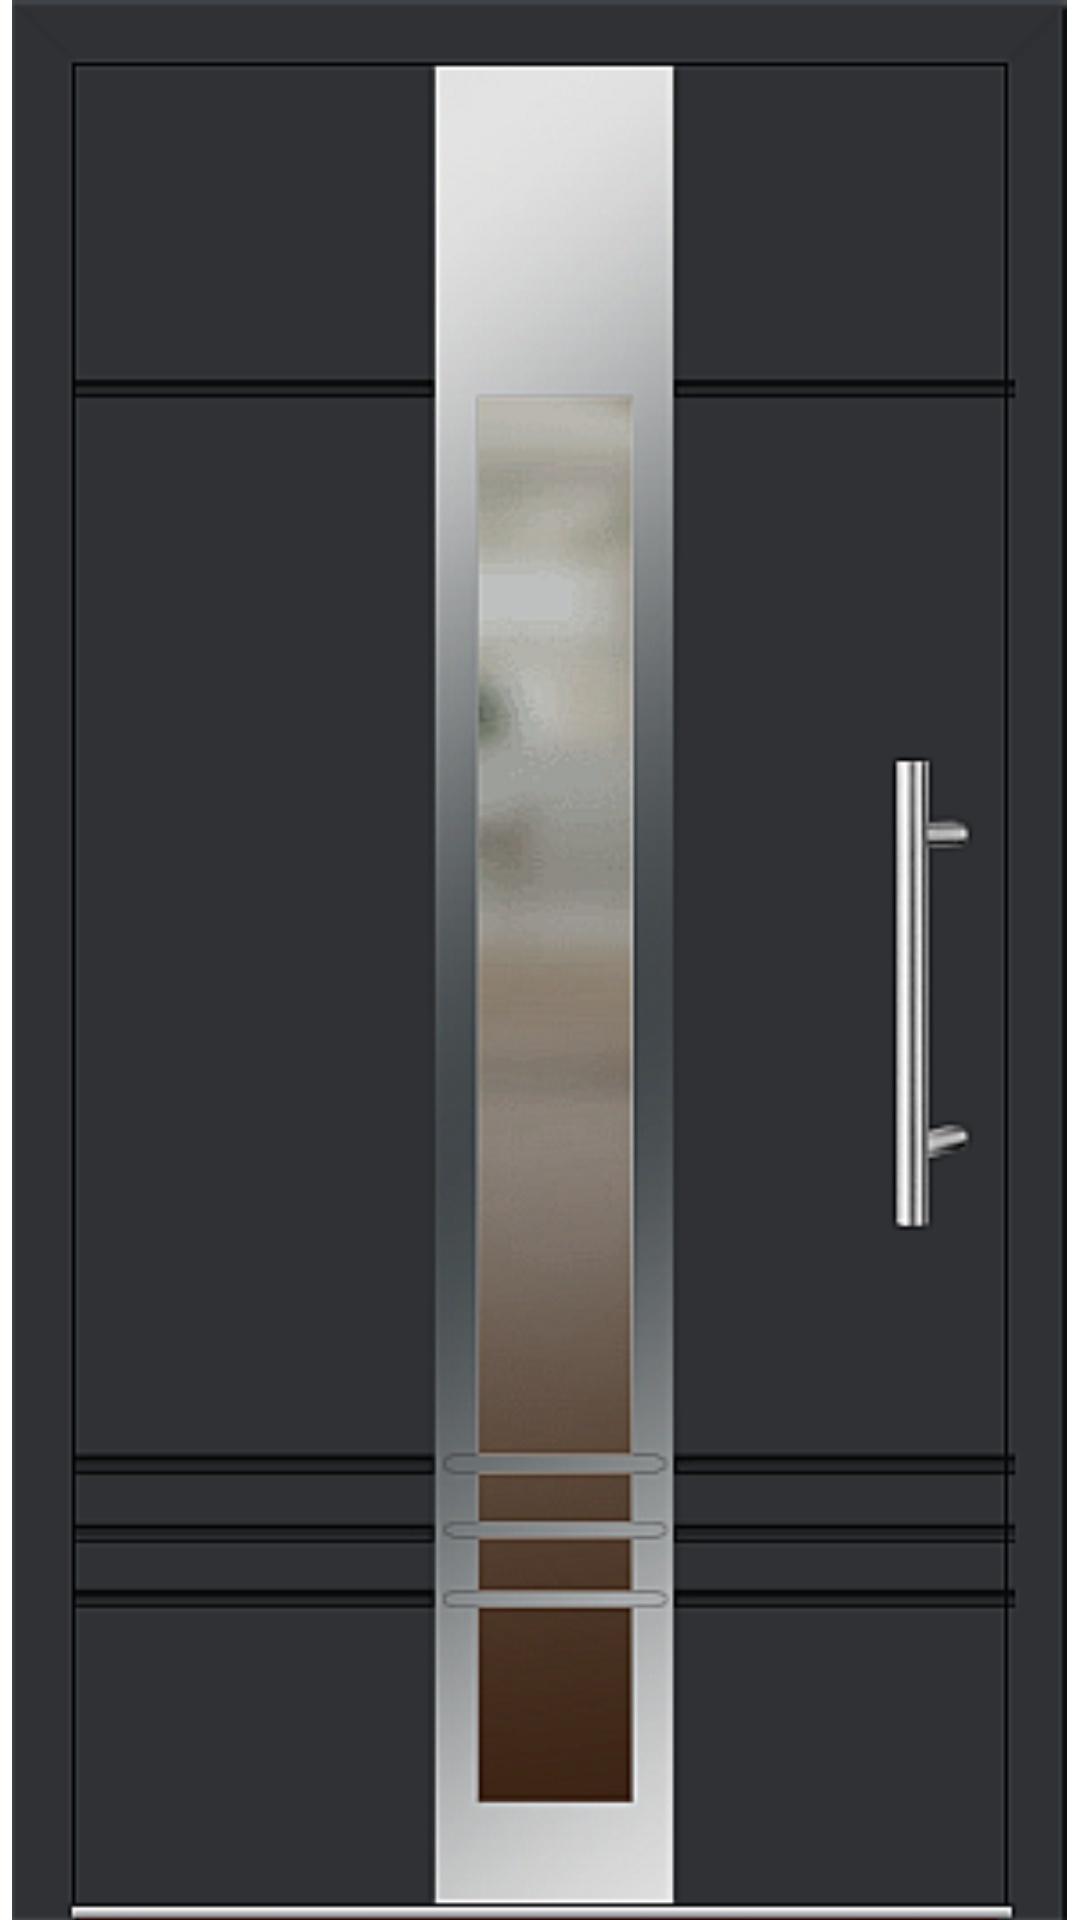 Aluminium Haustür Modell 6469-79 schwarz